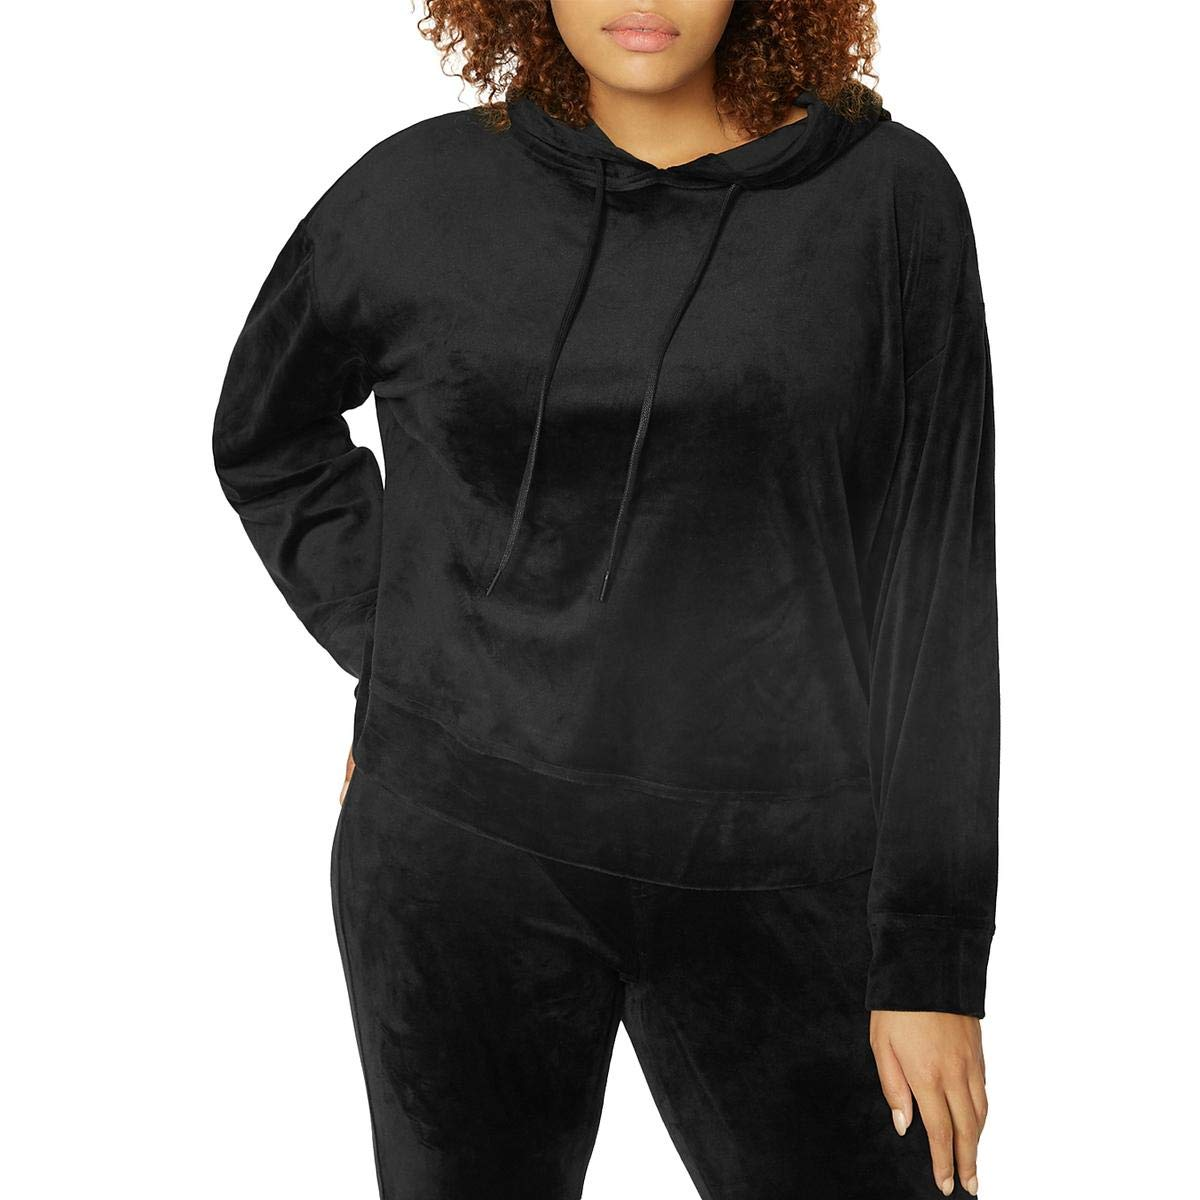 Sanctuary Women's Melrose Brigade Velour Hoodie Sweatshirt